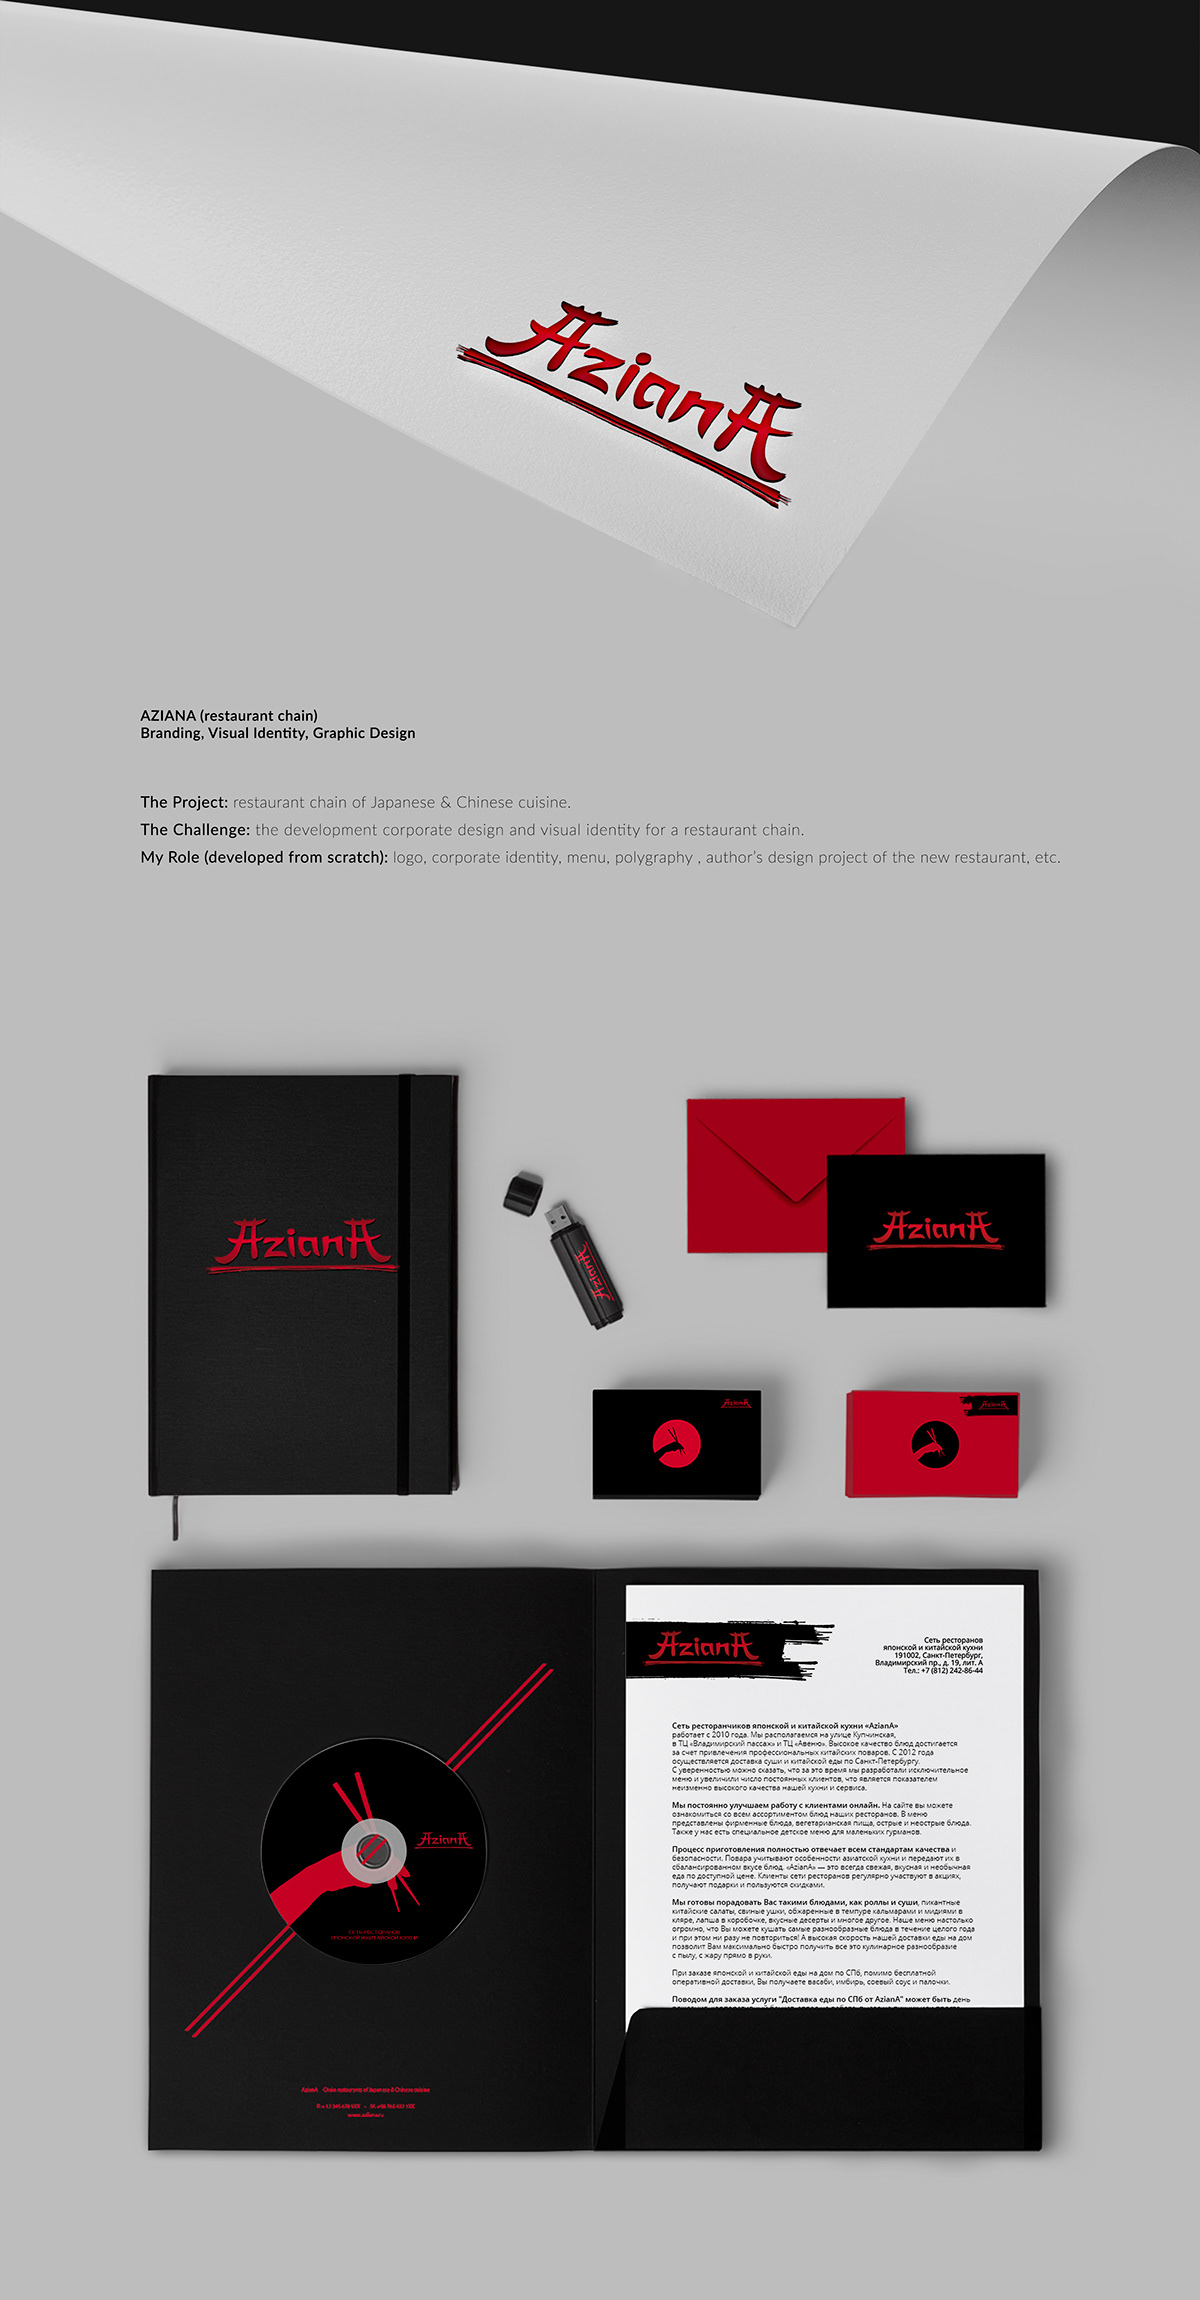 Restaurant Branding Visual Identity Graphic Design On Aiga Member Gallery